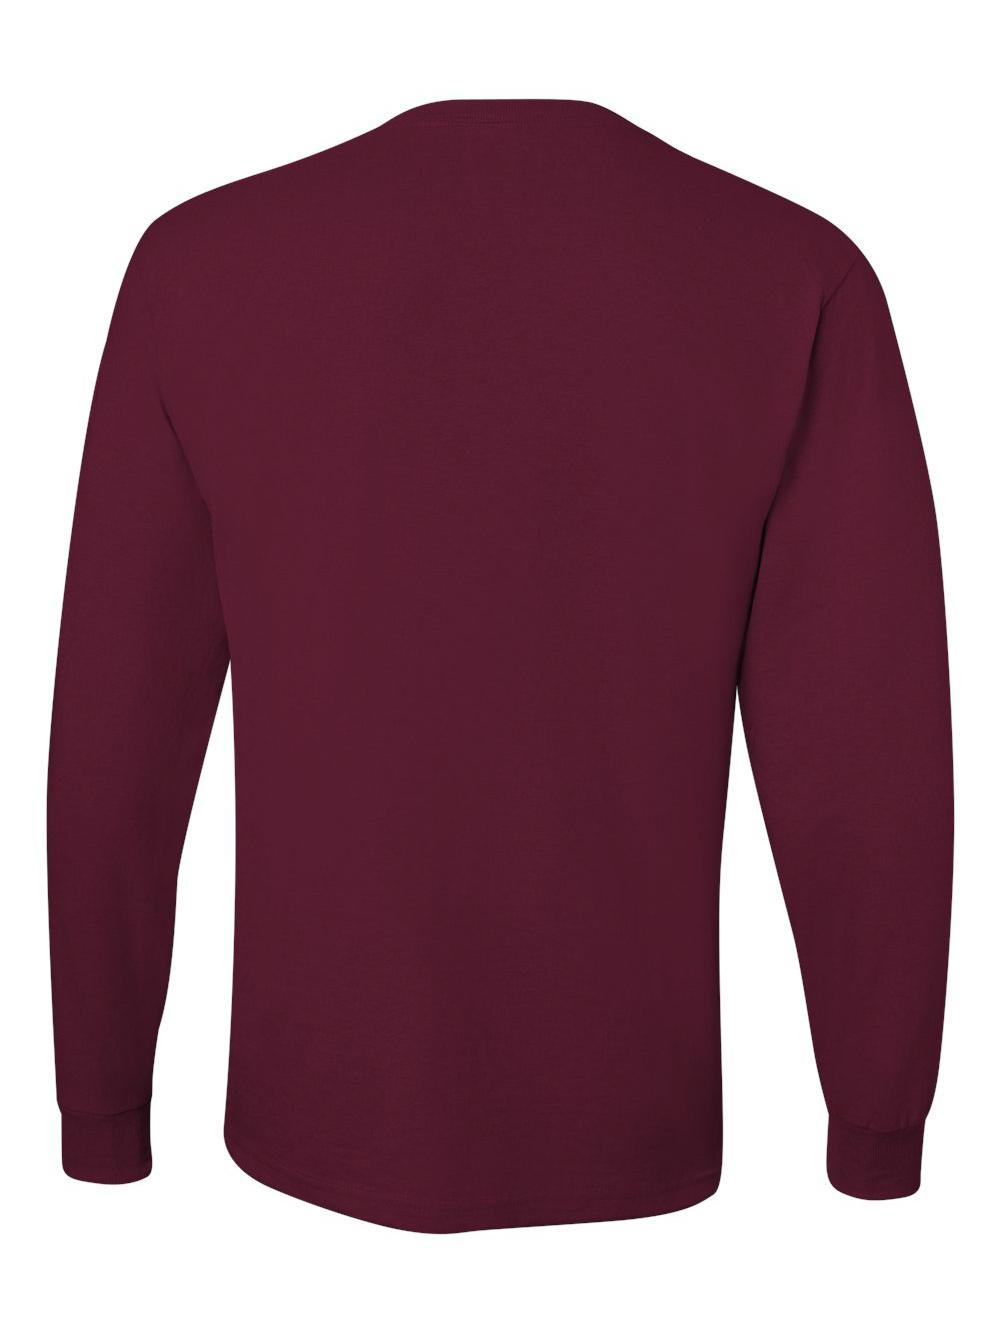 Jerzees-Dri-Power-Long-Sleeve-50-50-T-Shirt-29LSR thumbnail 58